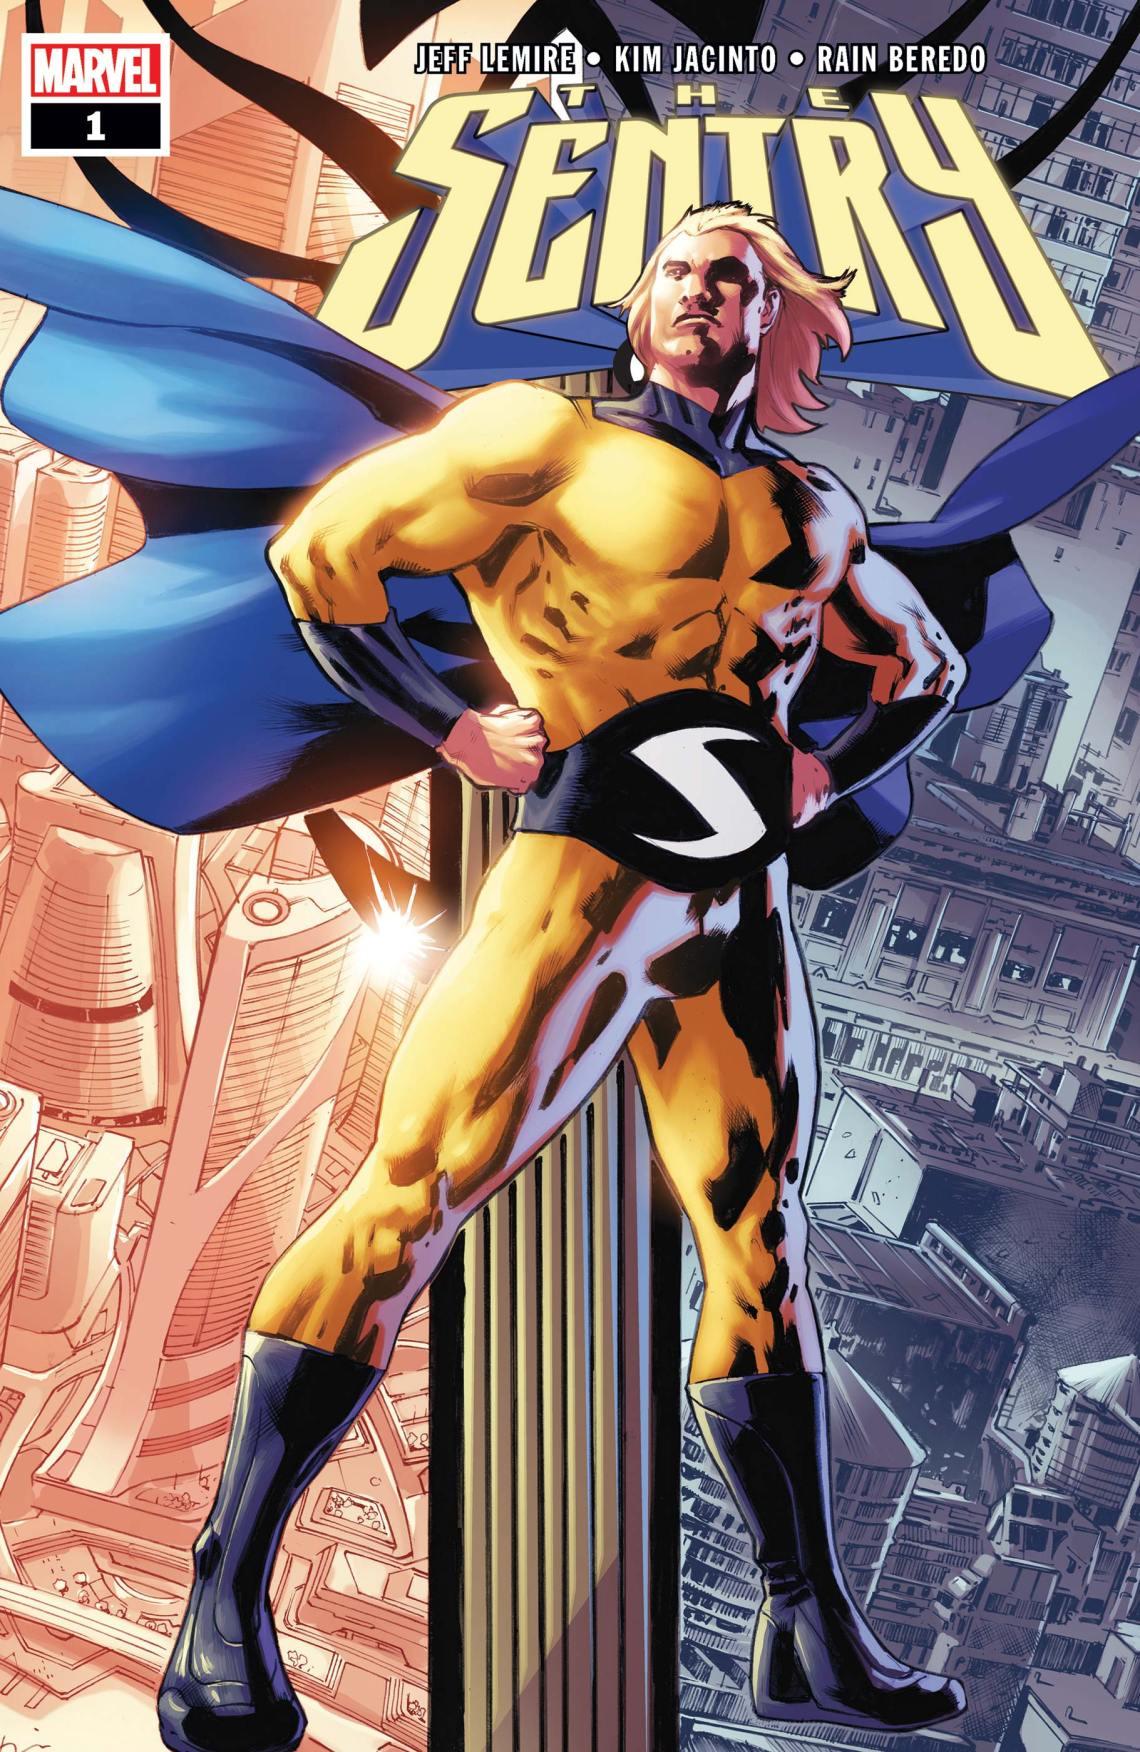 Sentry (2018) #1 | Comic Issues | Marvel